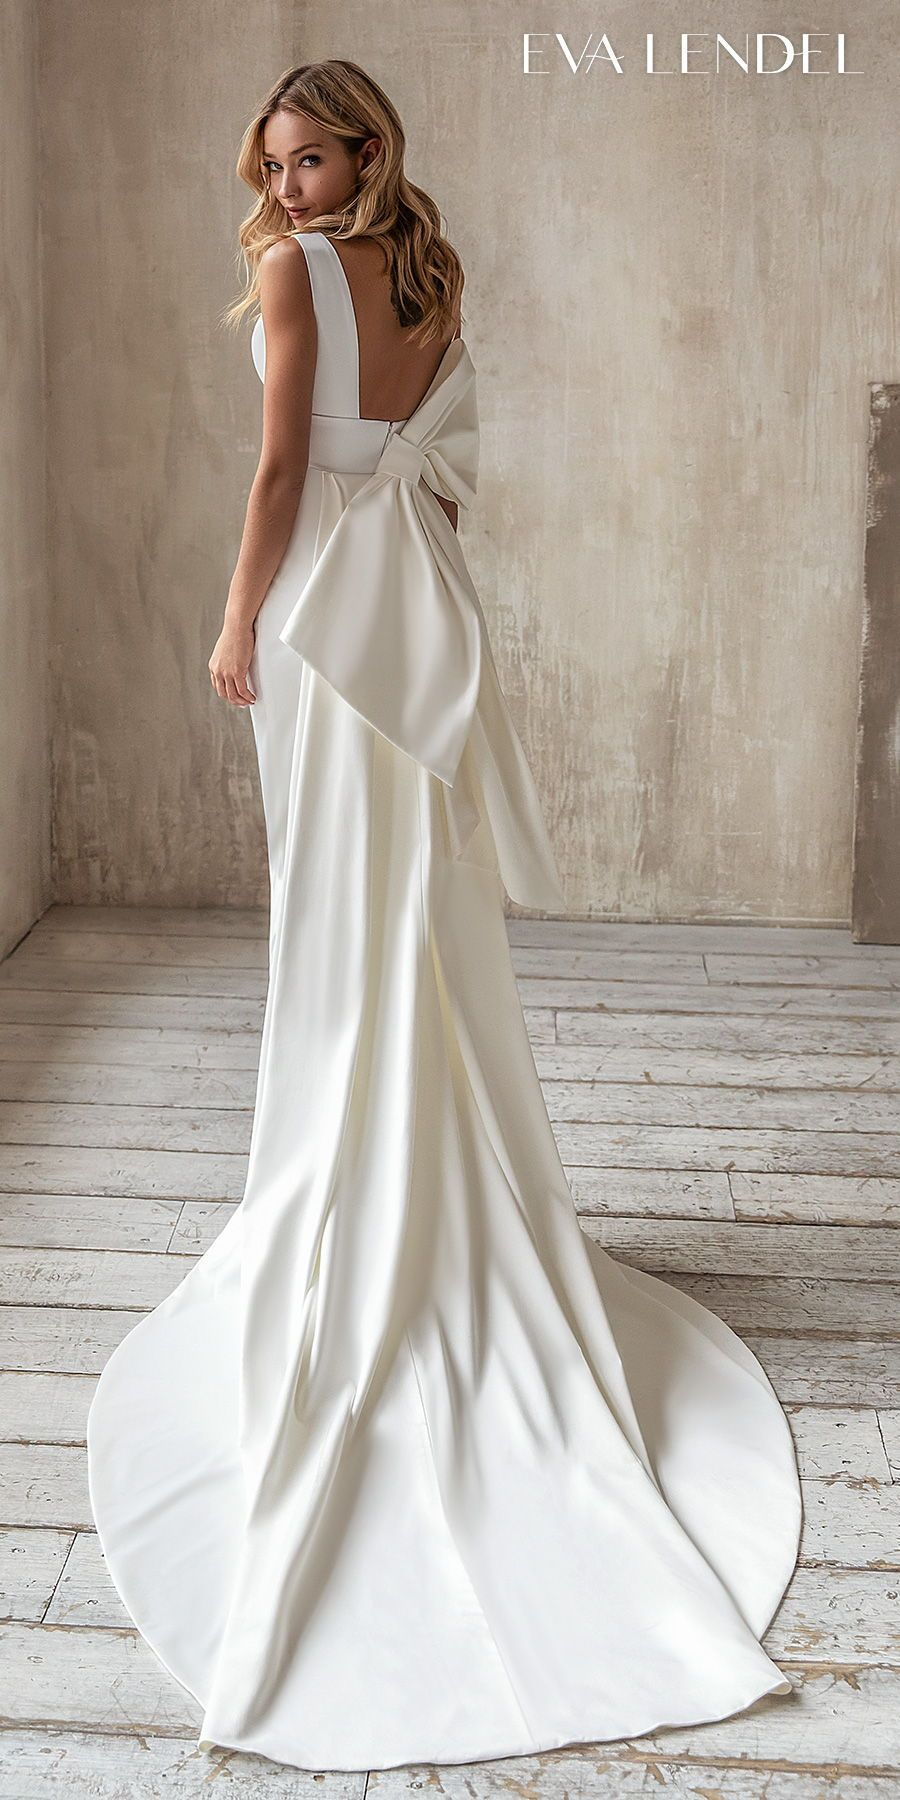 Eva Lendel 2021 Wedding Dresses Less Is More Bridal Collection Wedding Inspirasi Bow Wedding Dress Satin Wedding Gown Elegant Wedding Dress [ 1800 x 900 Pixel ]